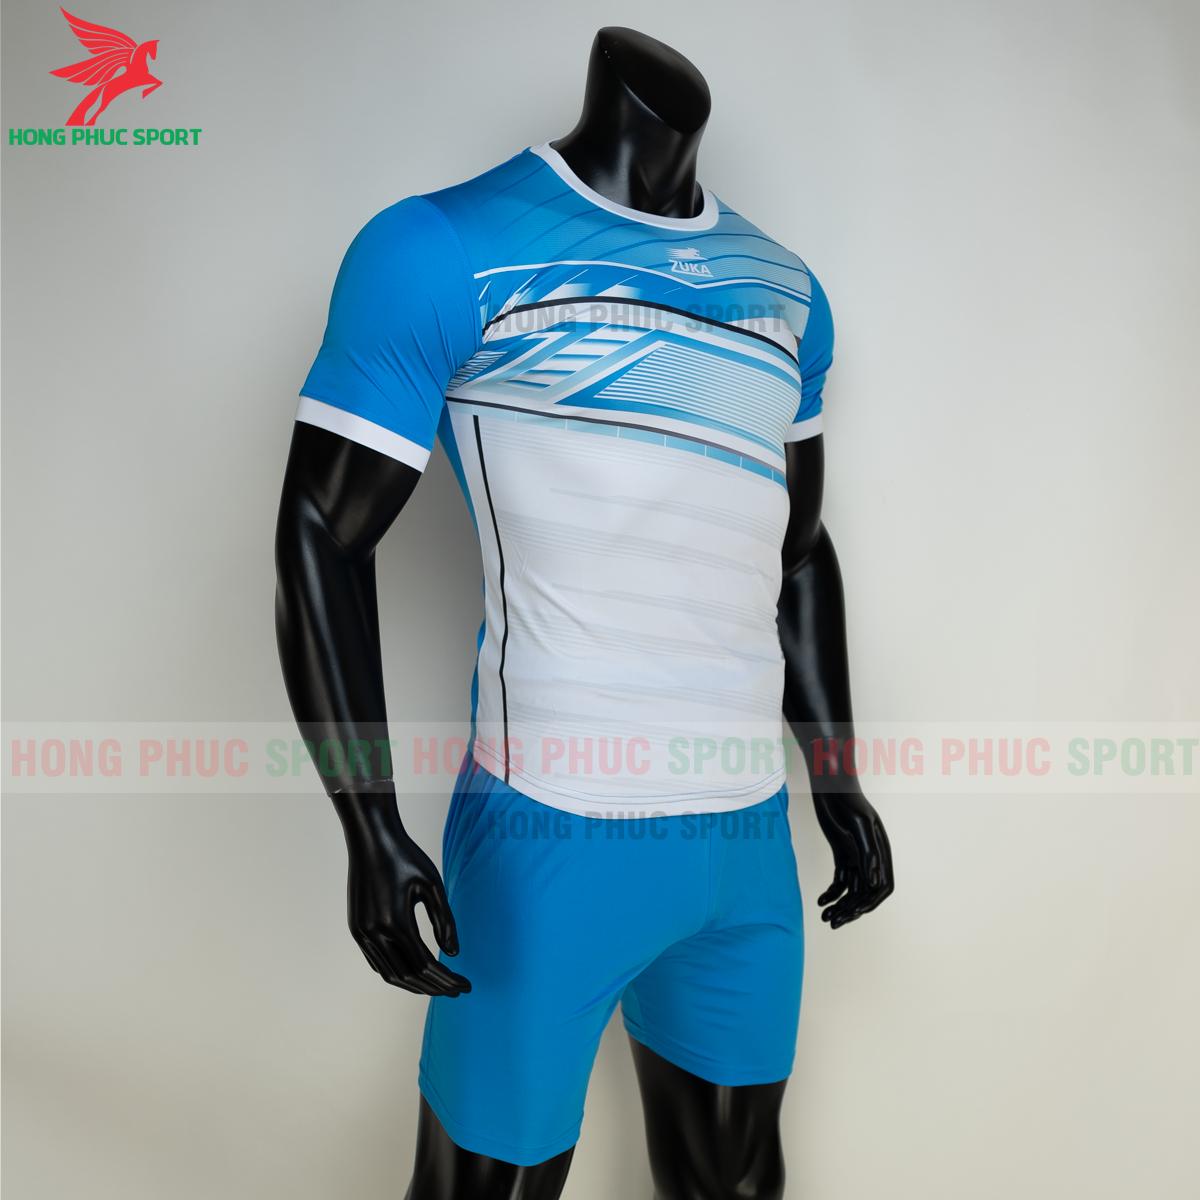 https://cdn.hongphucsport.com/unsafe/s4.shopbay.vn/files/285/ao-bong-da-khong-logo-zuka-01-mau-xanh-6-60502e7a7d758.png